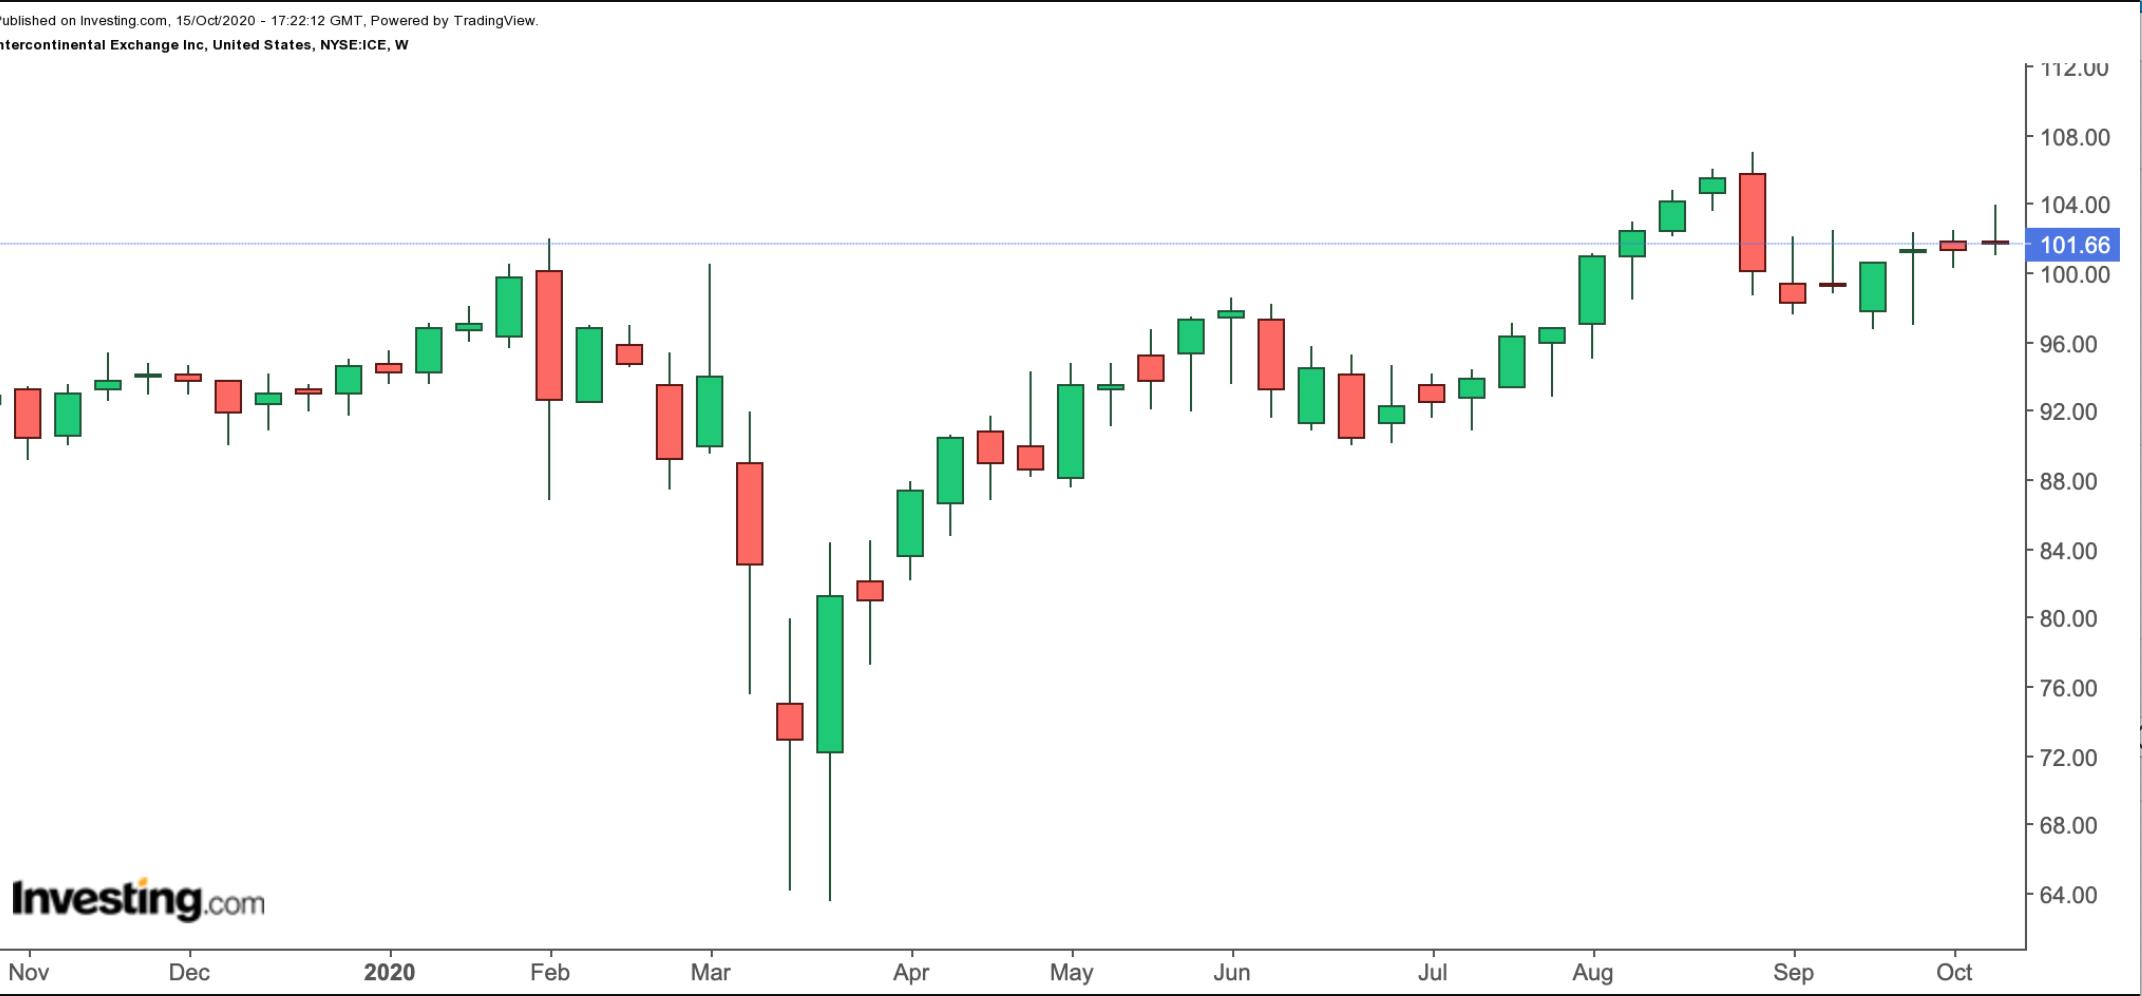 Intercontinental Exchange 1-Year Chart.